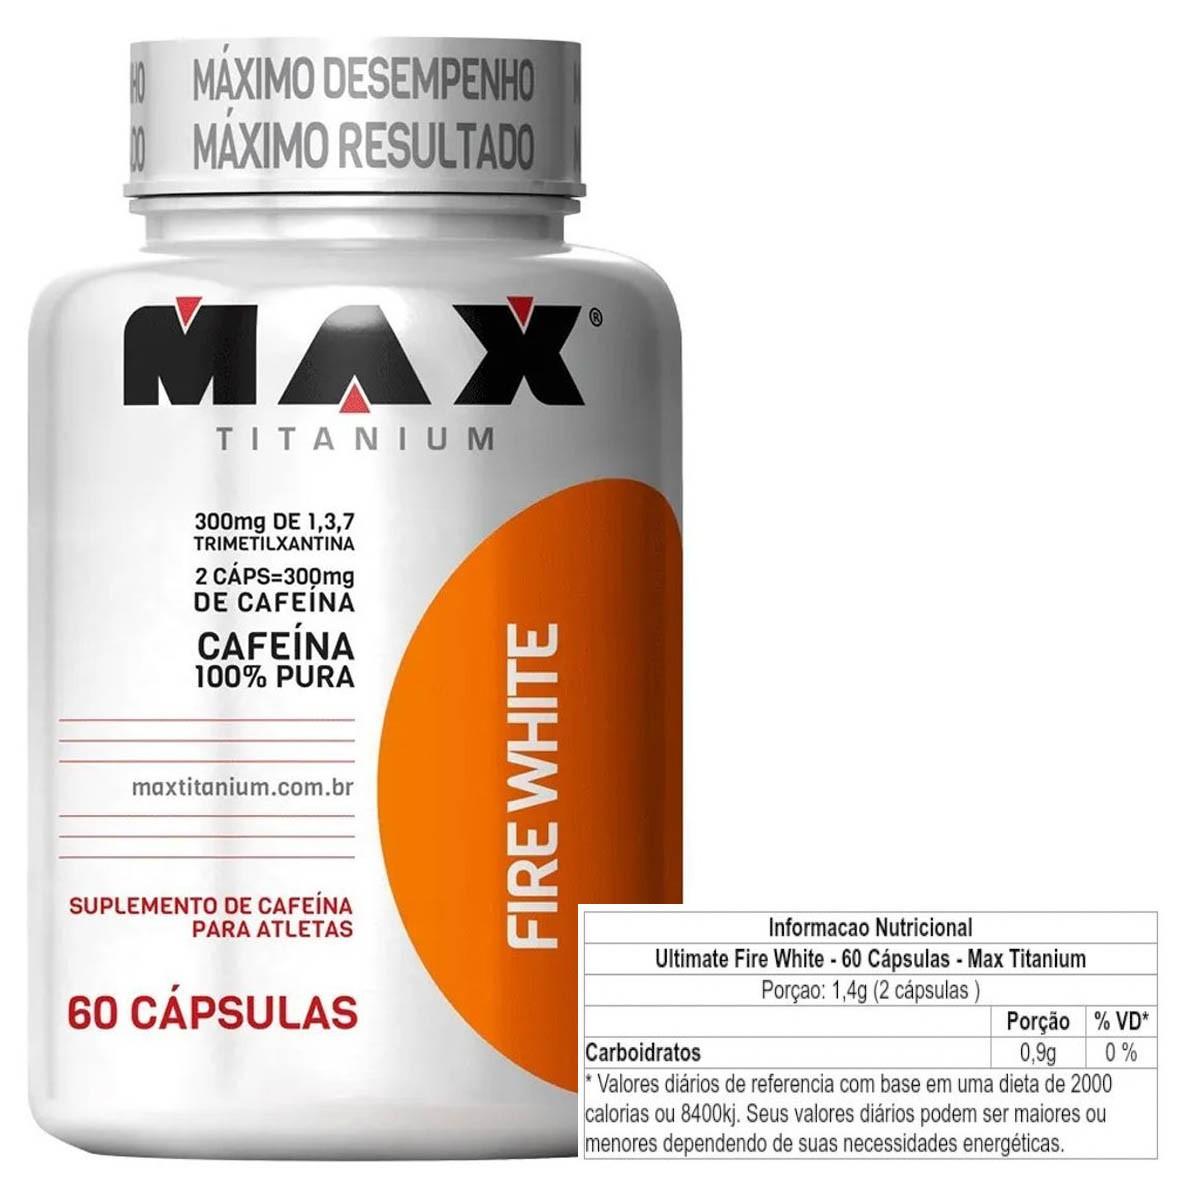 Fire White 60 Cápsulas - Max Titanium